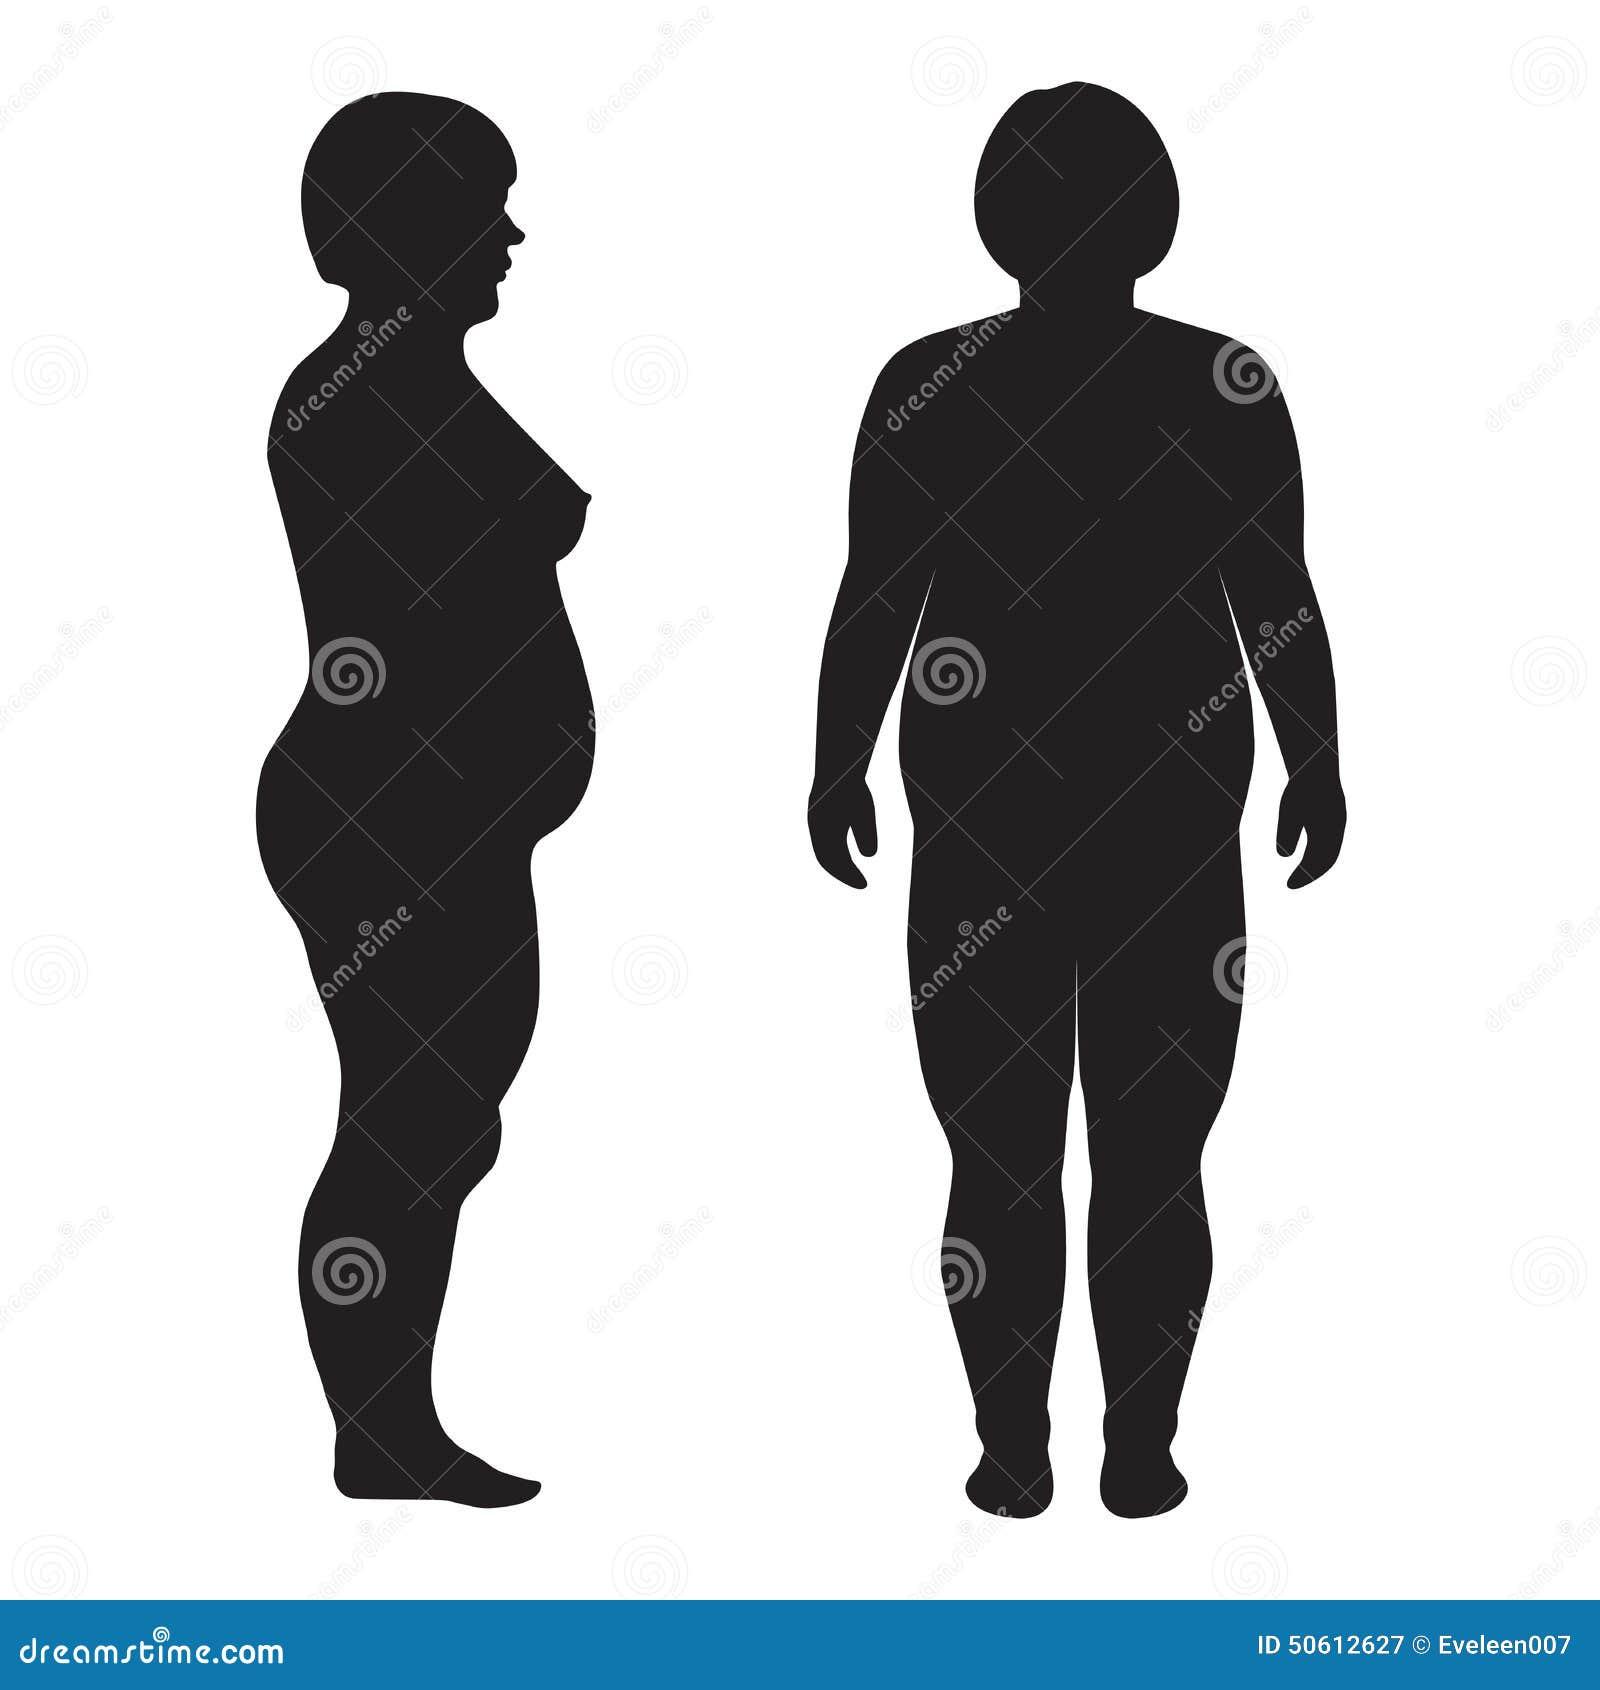 Mt2 fat loss photo 1